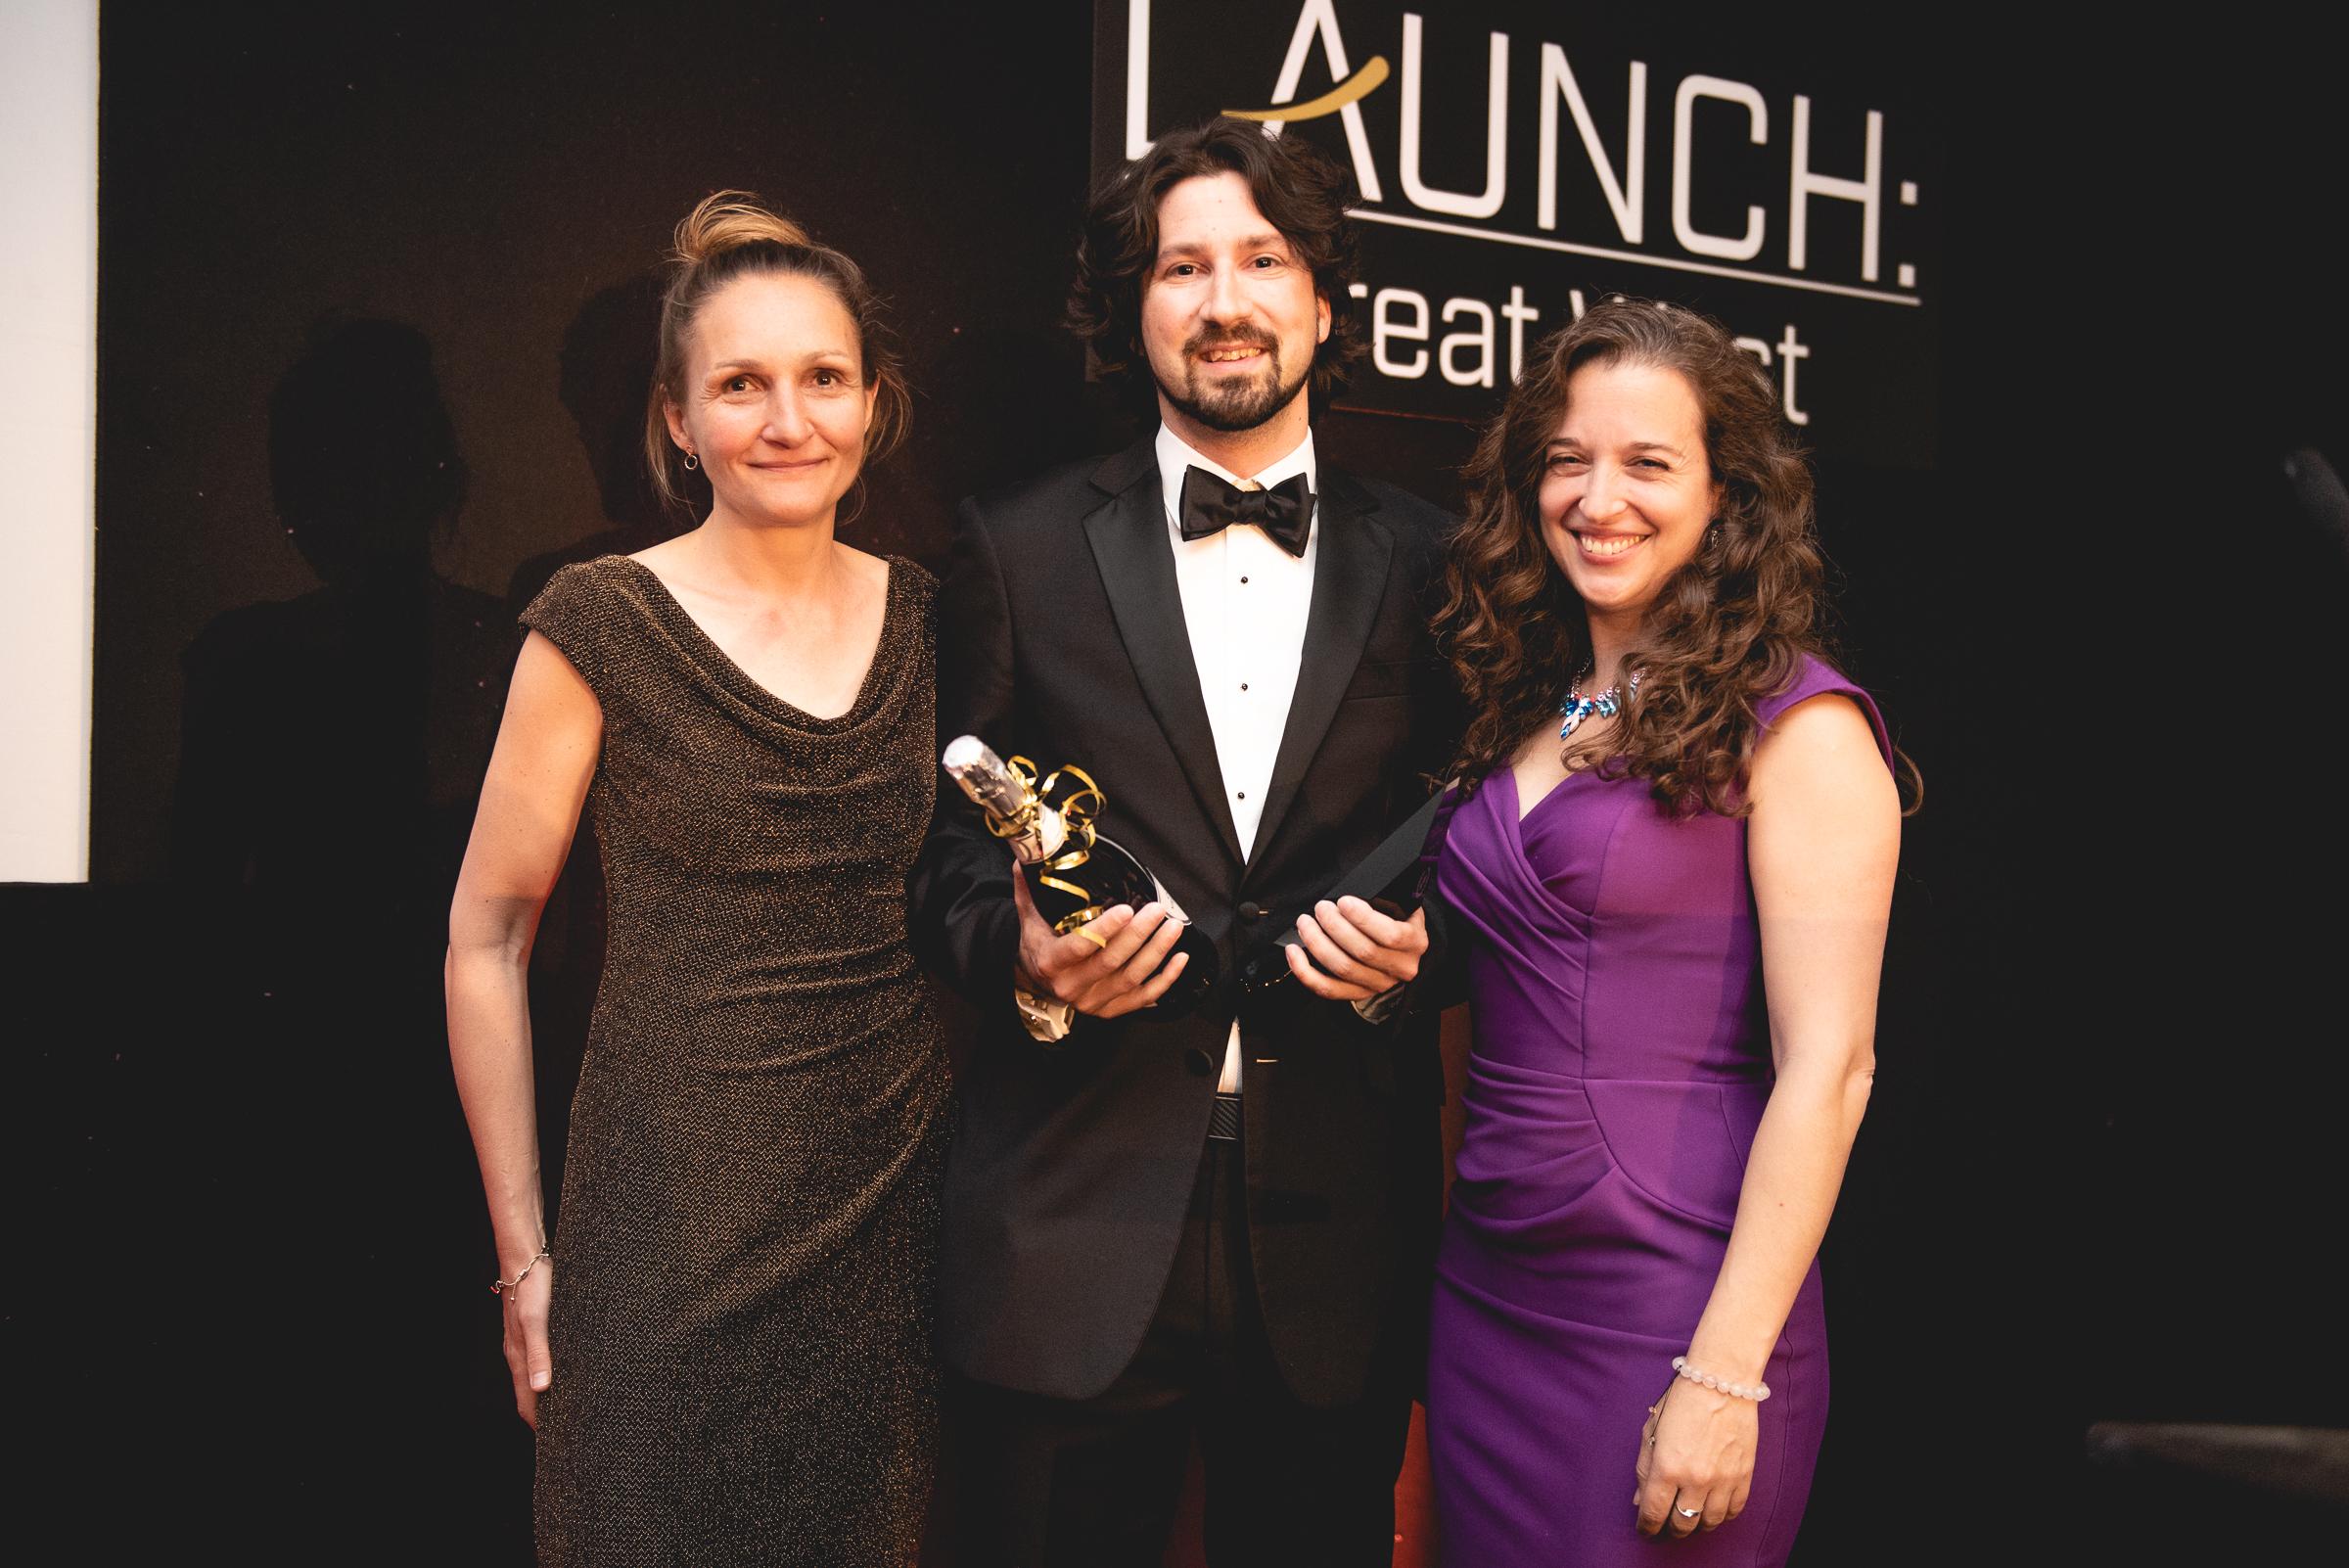 Ultrahaptics, winners of the Rocket Fuel Award, sponsored by University of Bath and Bath SETsquared  L to R; Rosie Bennett, Rob Blenkinsopp, Dr Emily Grossman